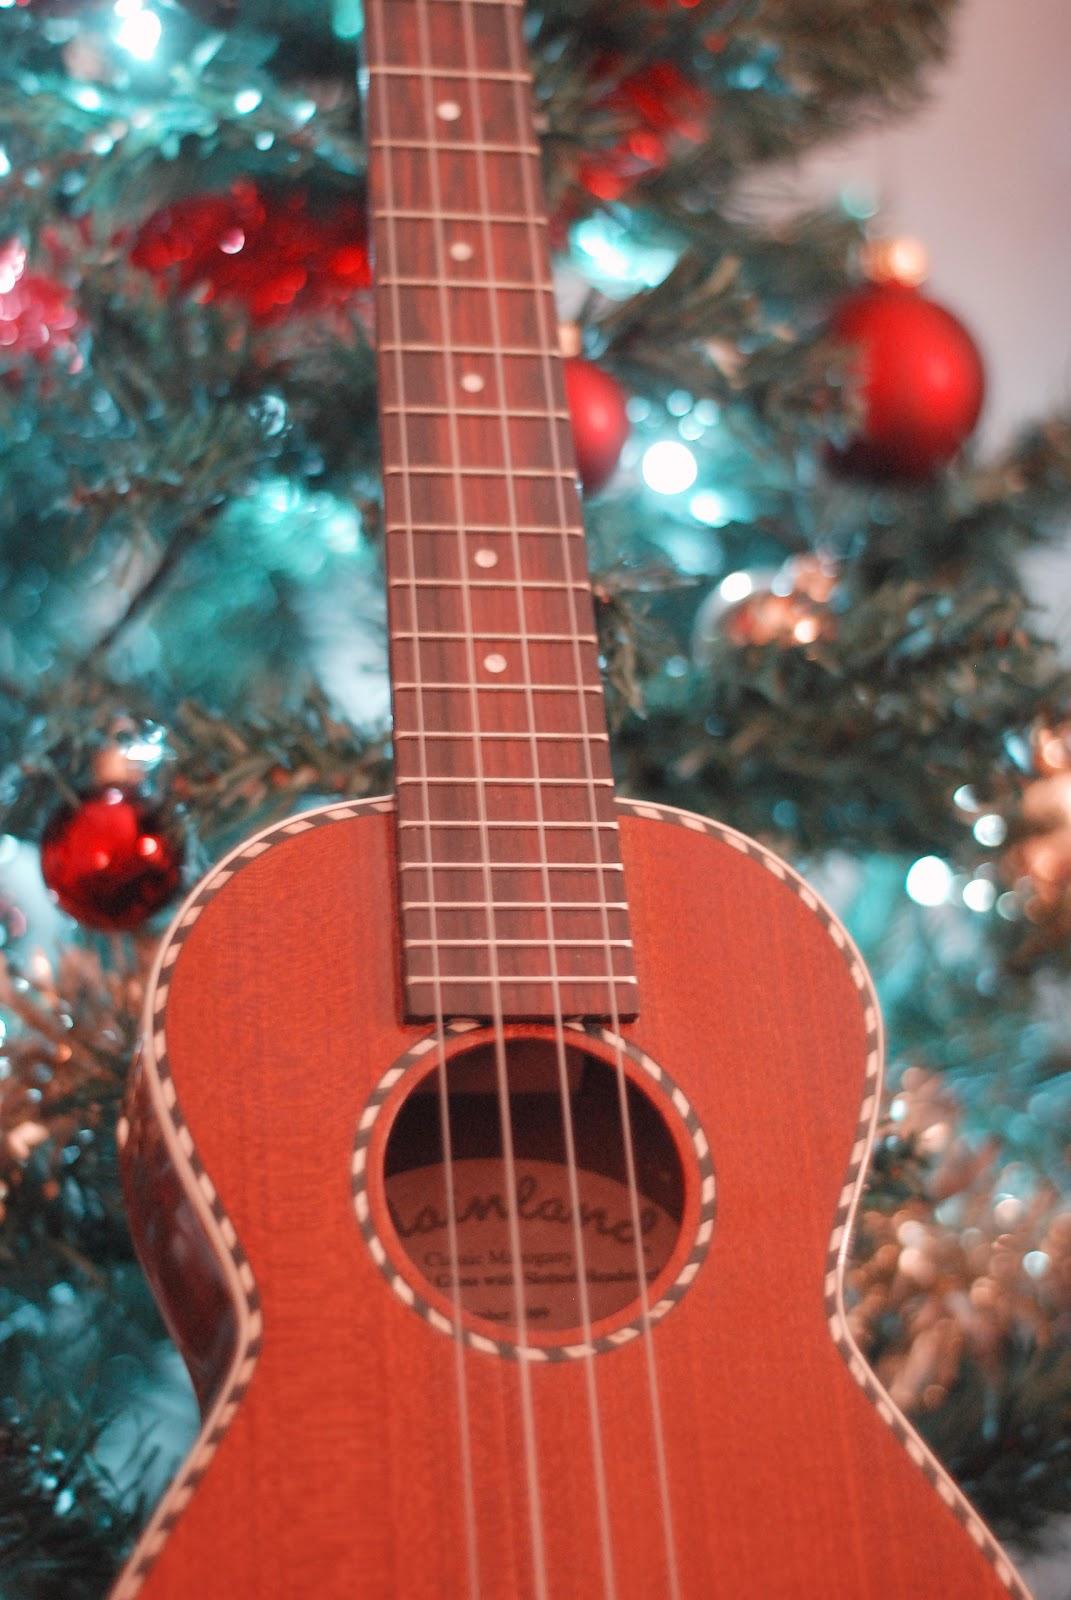 Merry Ukulele Christmas